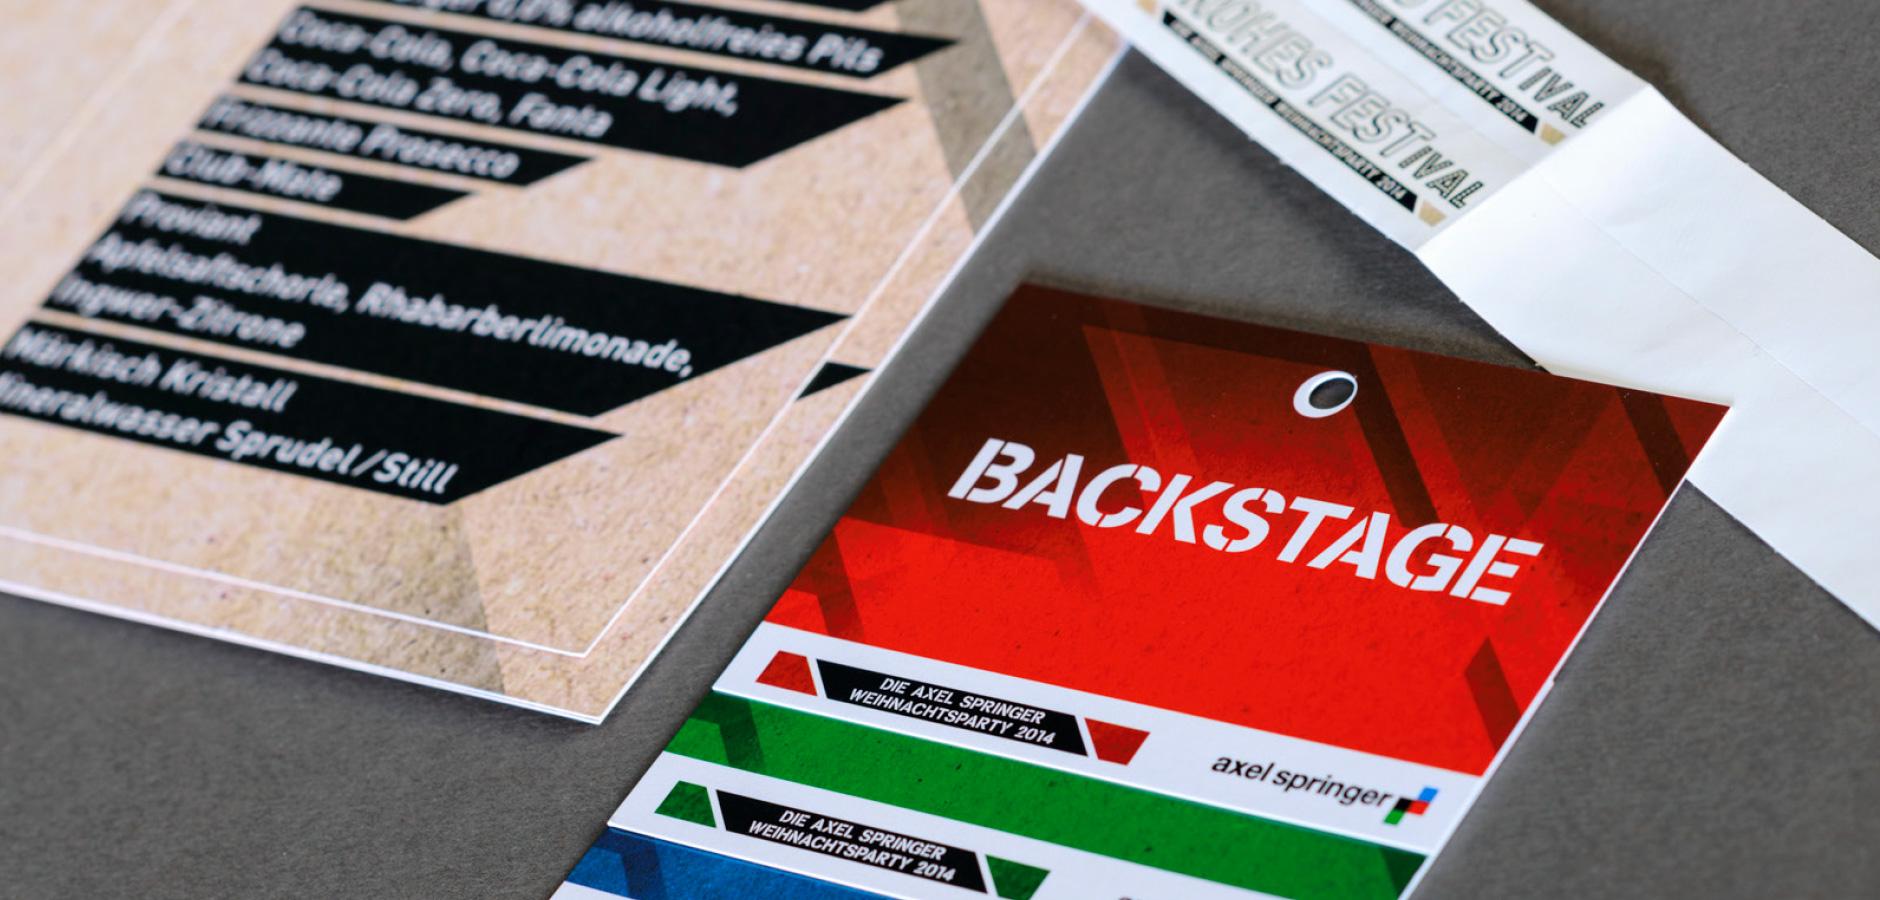 Axel Springer SE - Entwicklung Keyvisual & Event Branding